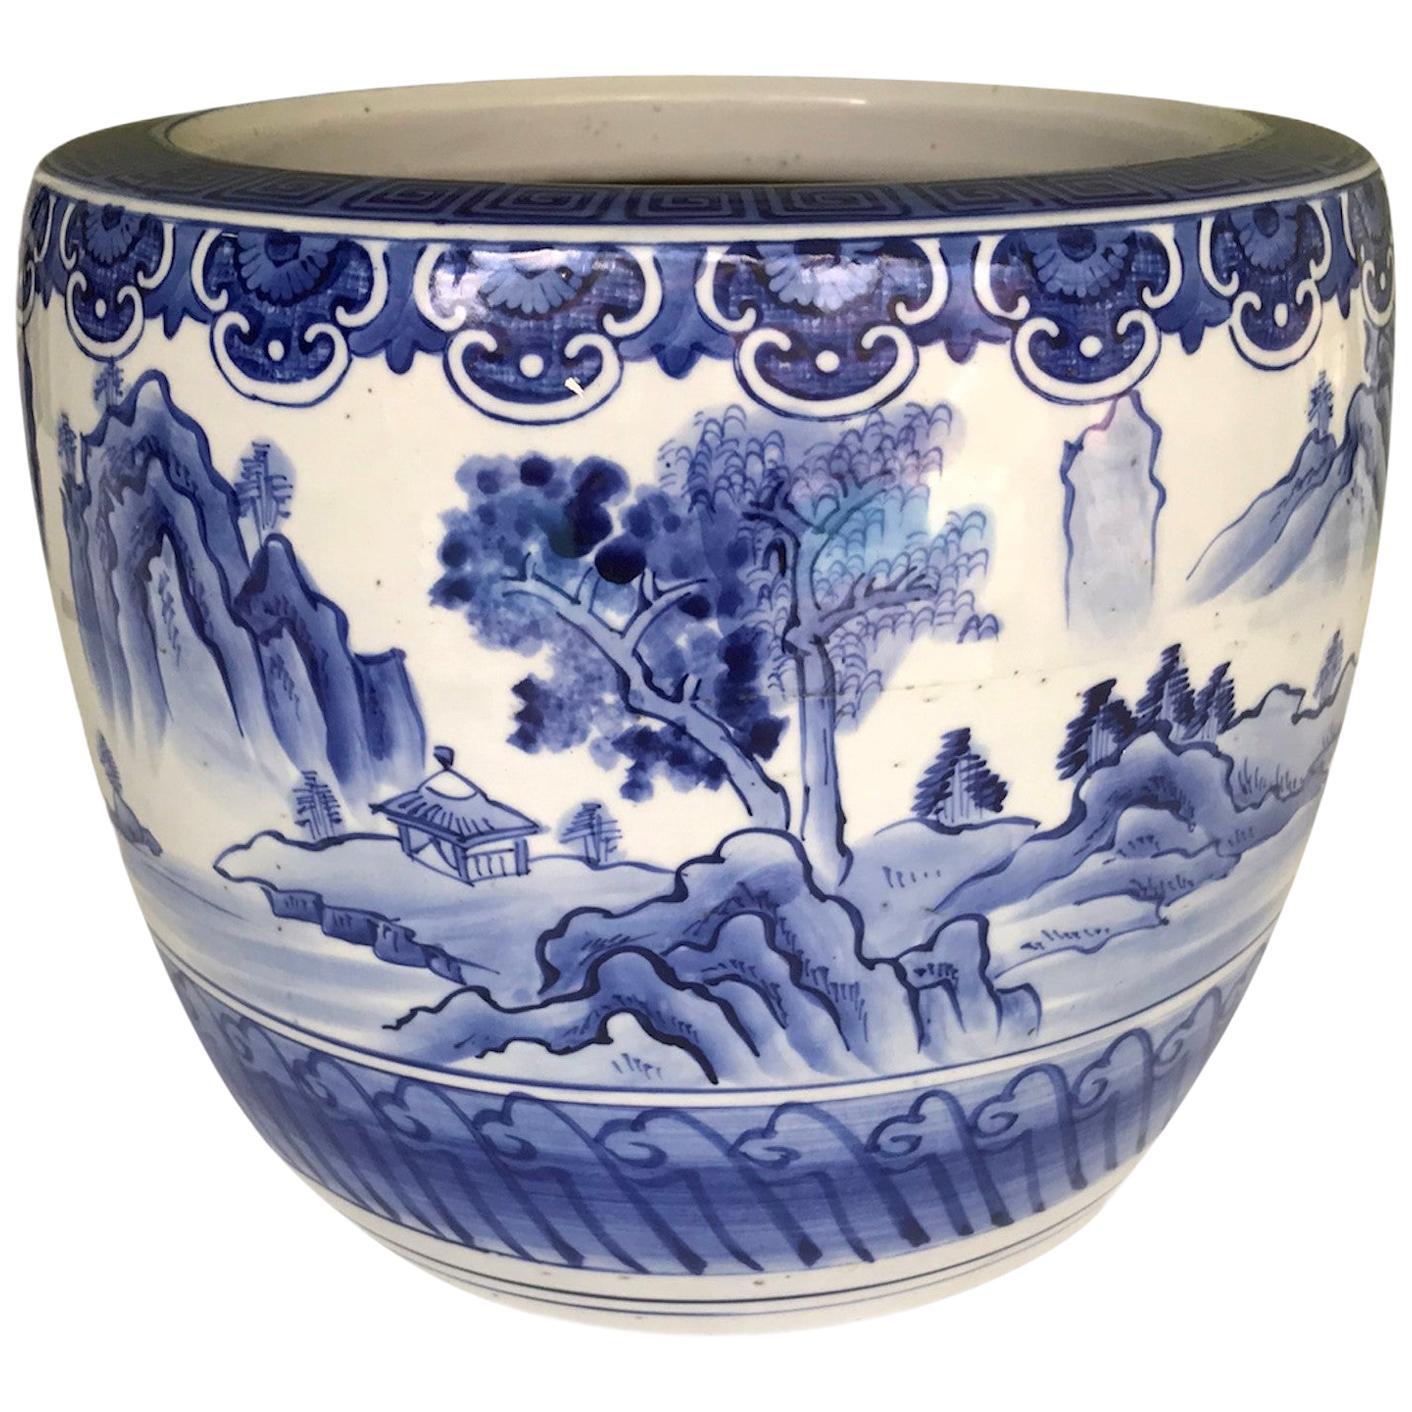 Blue and White Ceramic Japanese Hibachi 1960s Hand Painted Serene Village Scene